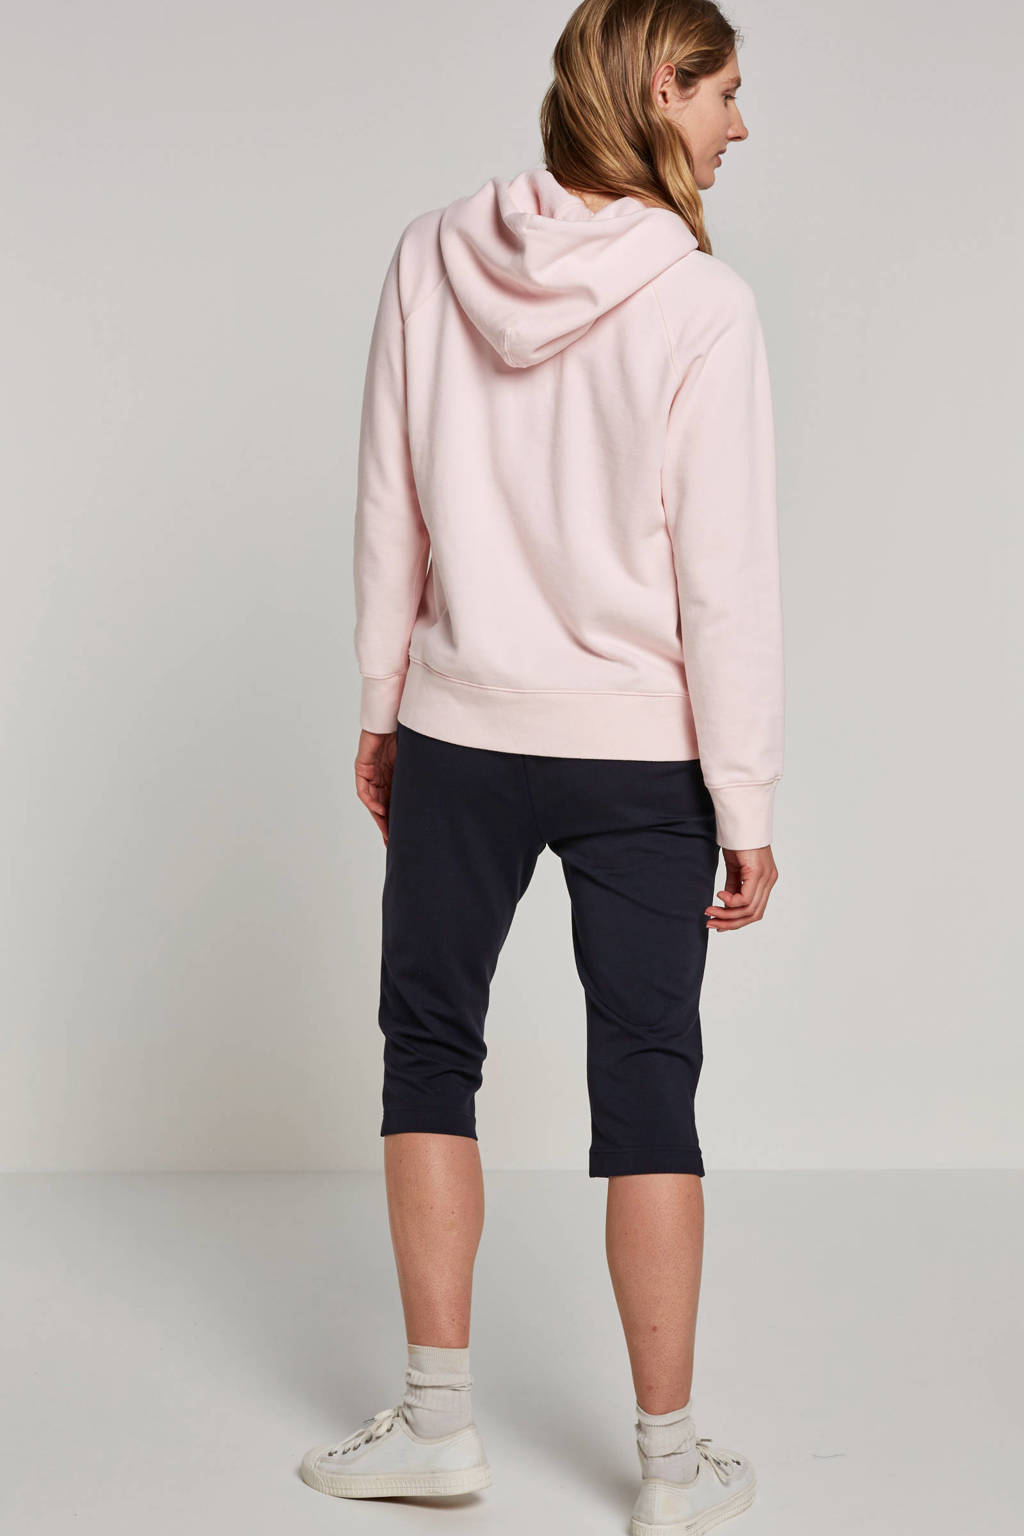 Sweater Sweater Levi'slogo Roze Sweater Levi'slogo Roze Levi'slogo Levi'slogo Roze 5Uq0OUg